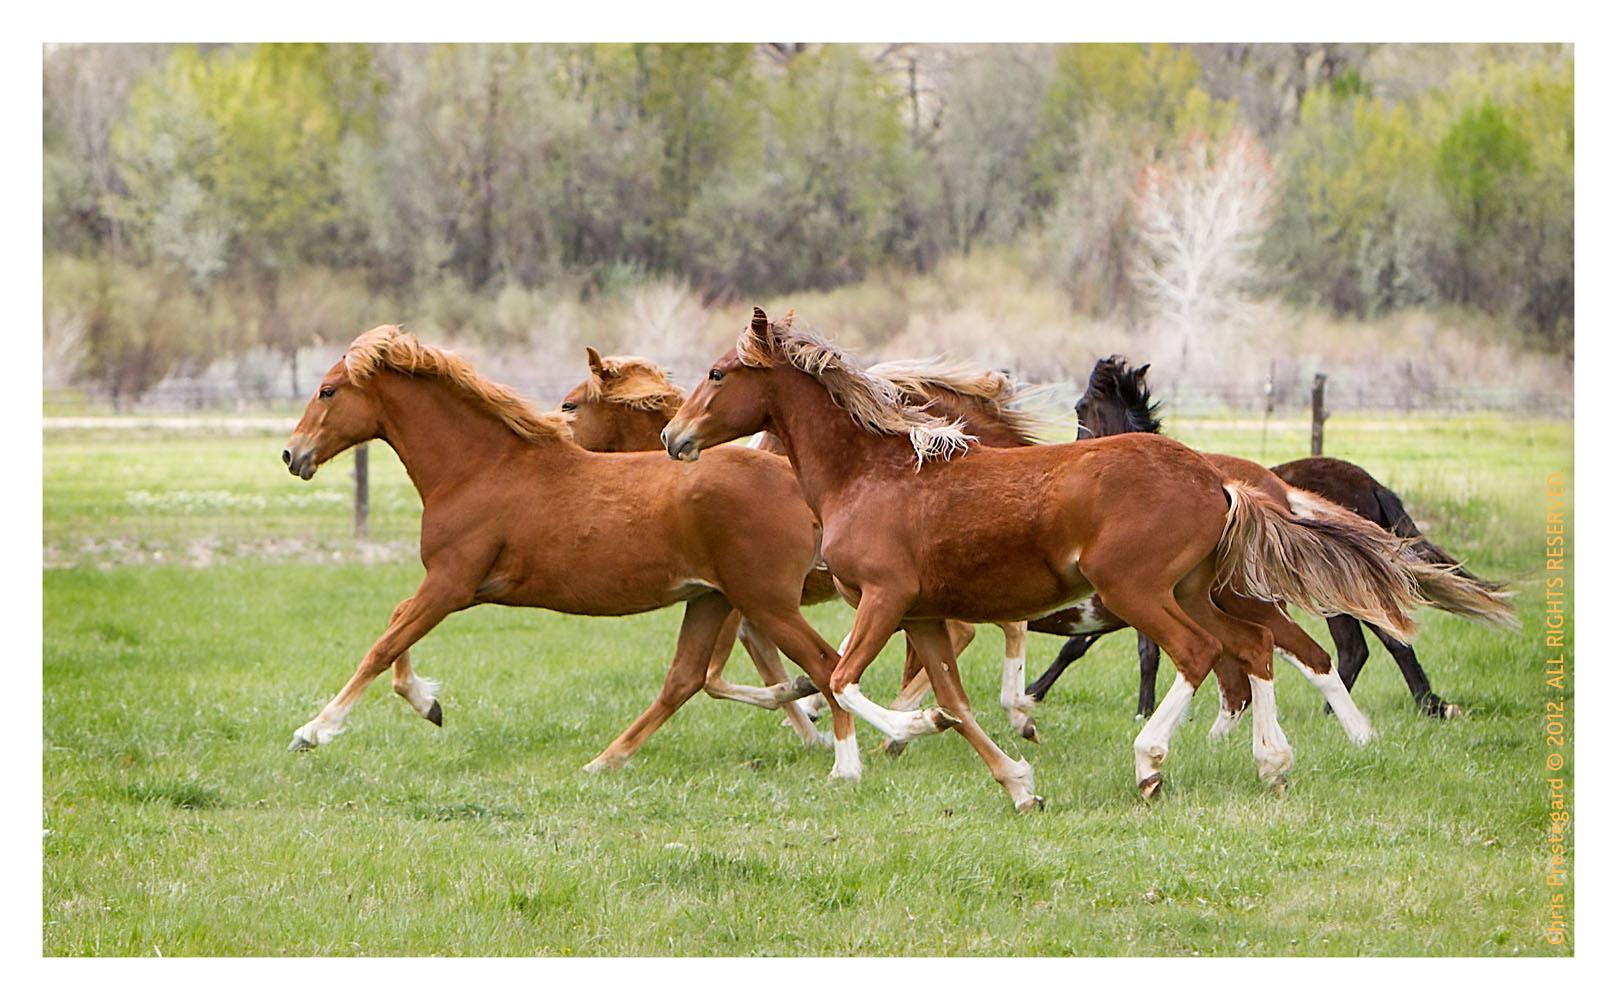 Horse3366-Feb11-2012